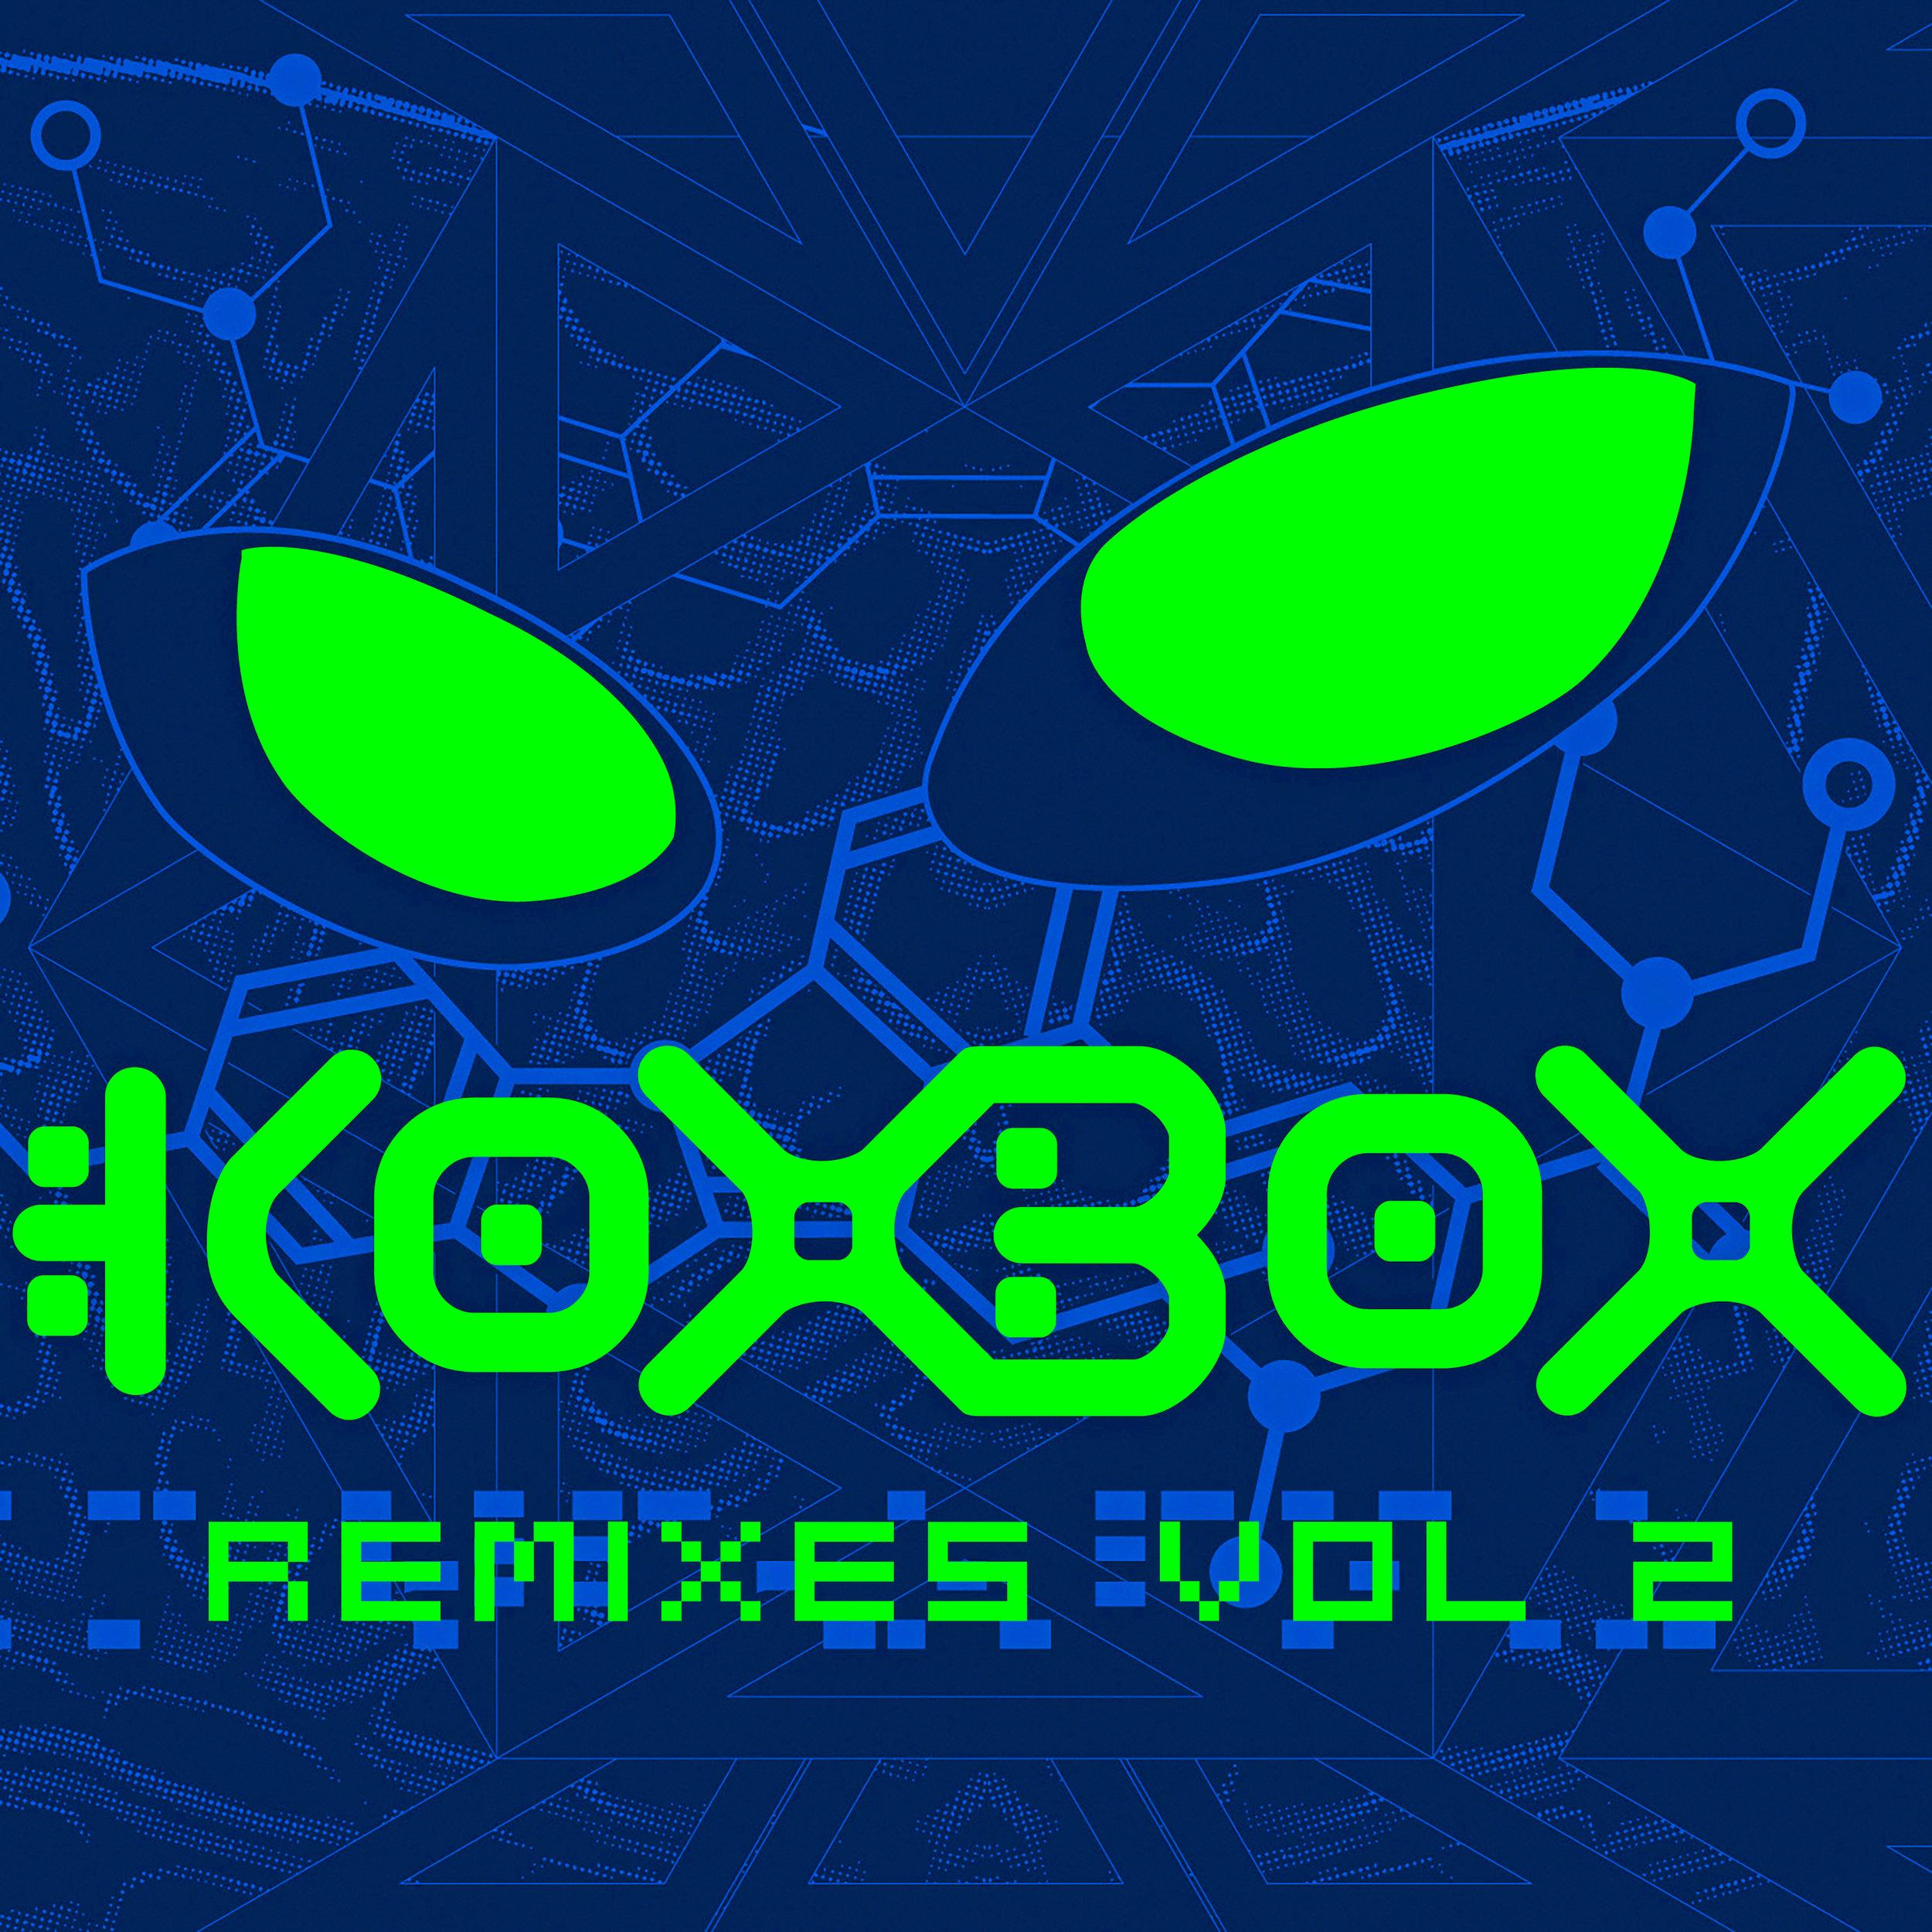 Koxbox- The Scanner Remix Vol. 2 - 2017